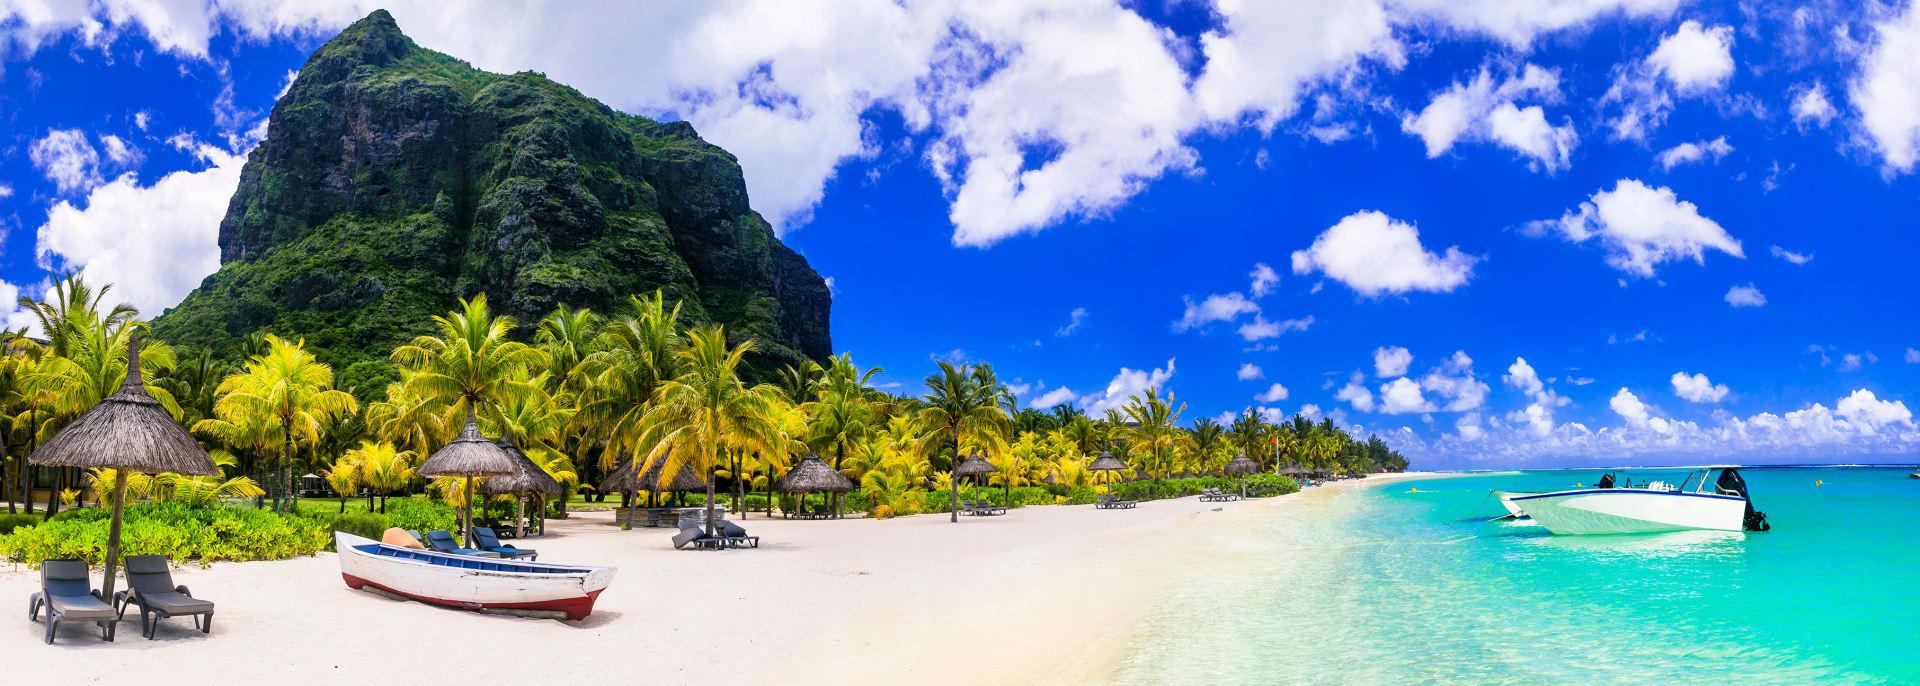 Mittelklasse, Mauritius